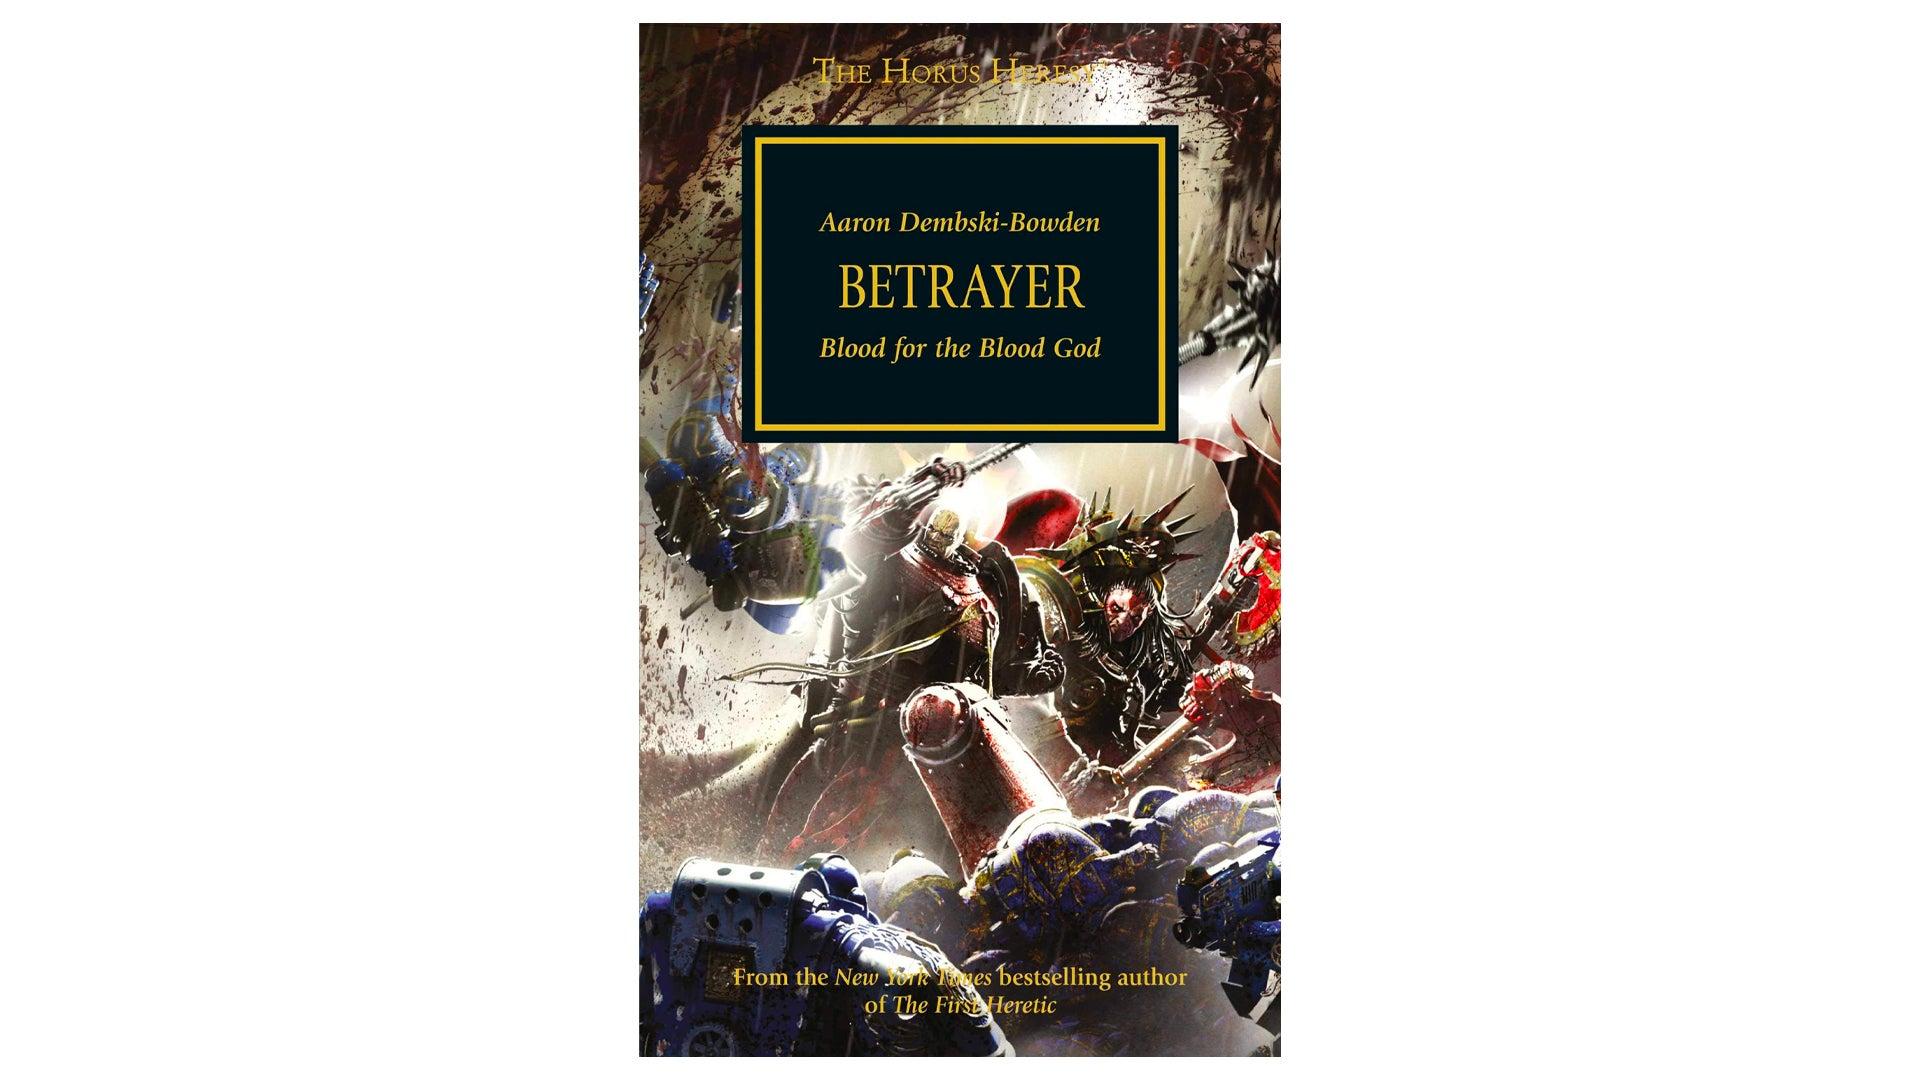 warhammer-40k-book-black-library-betrayer.jpg